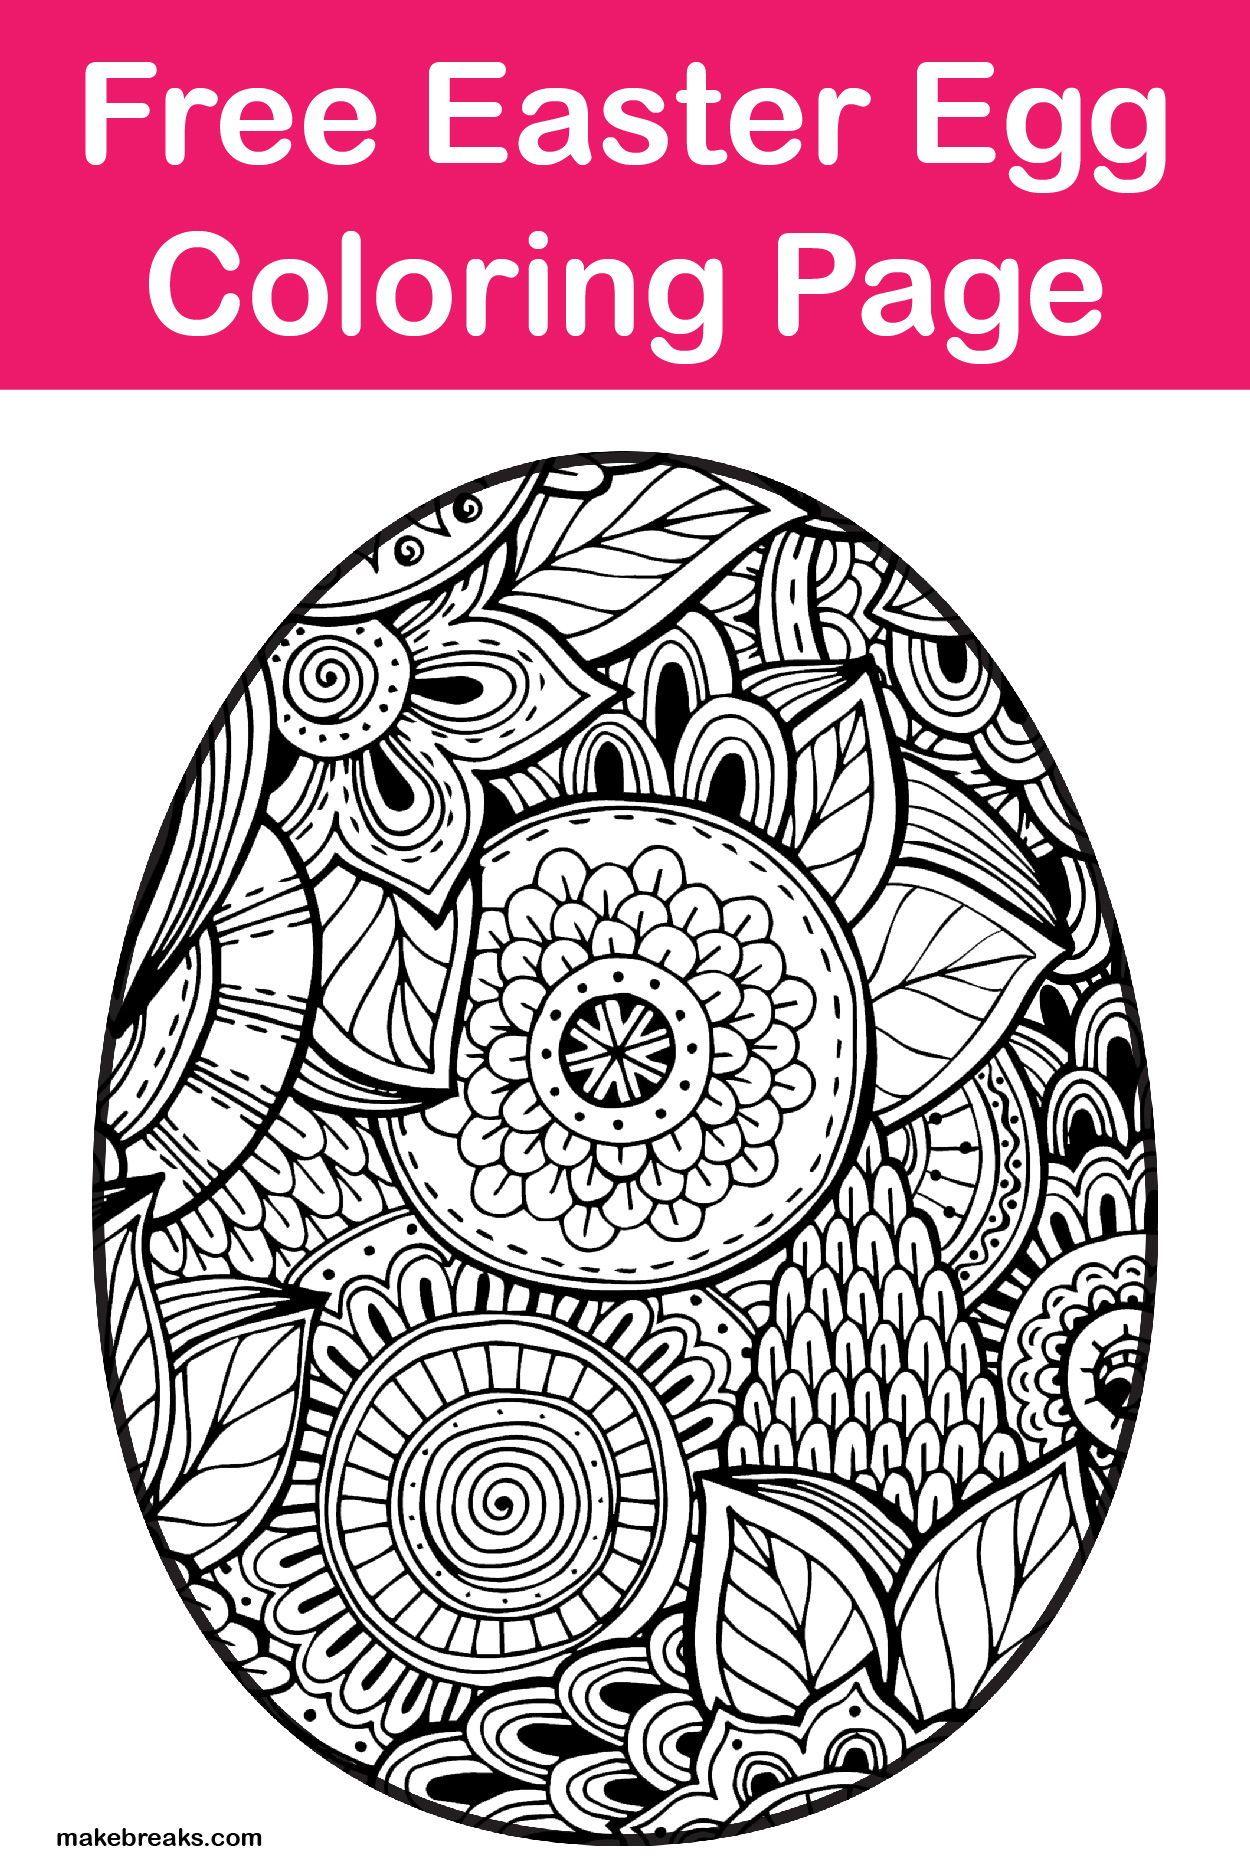 free easter egg coloring page  make breaks  easter egg